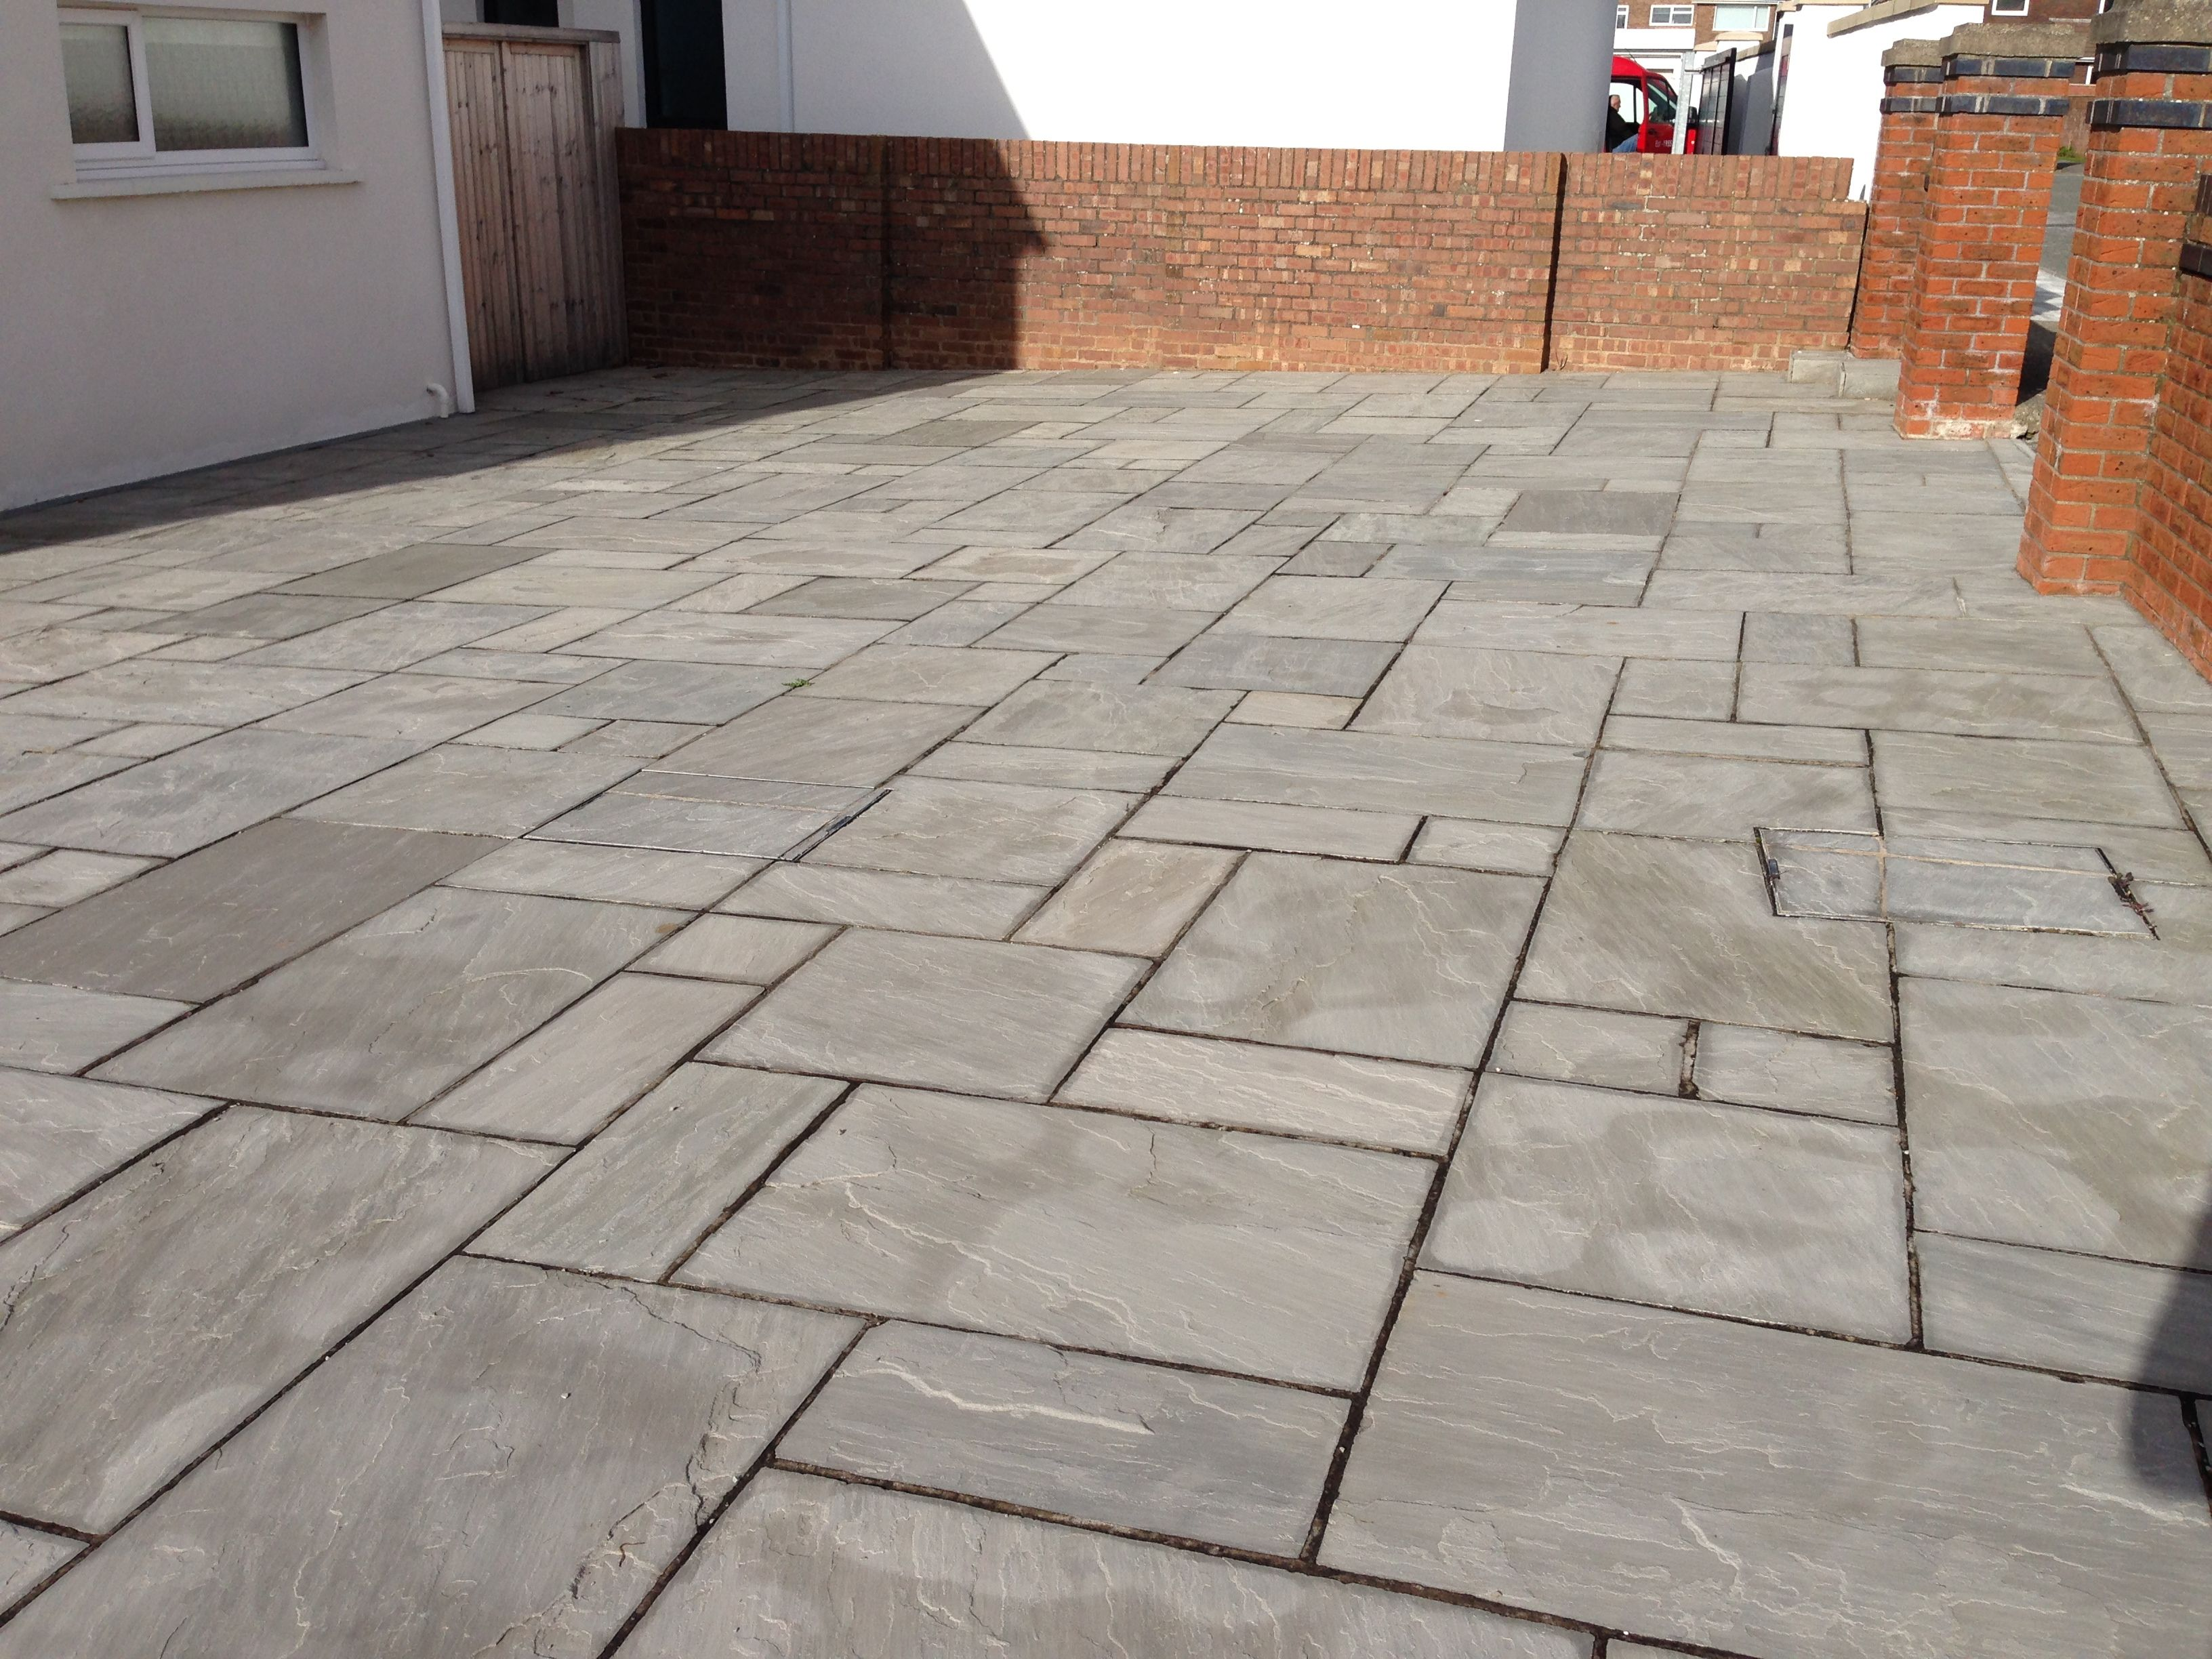 Kandla grey indian paving in wales flagstones natural flagstone kandla grey indian paving in wales flagstones dailygadgetfo Images